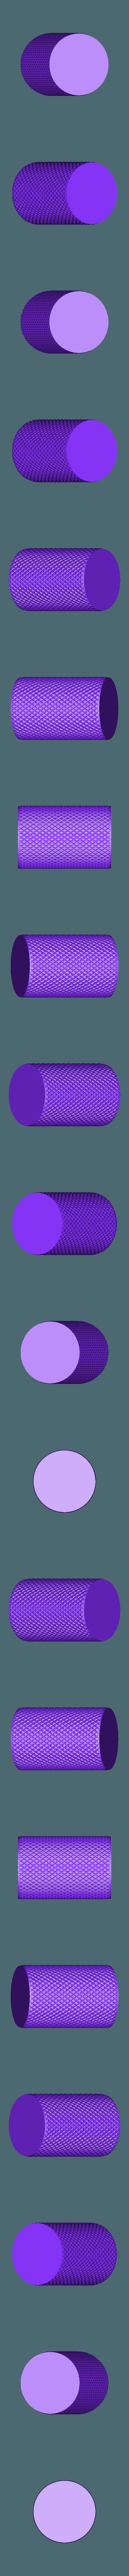 solid_pencilsPot.stl Download free SCAD file Knurled Pencils Pot • Template to 3D print, Wachet